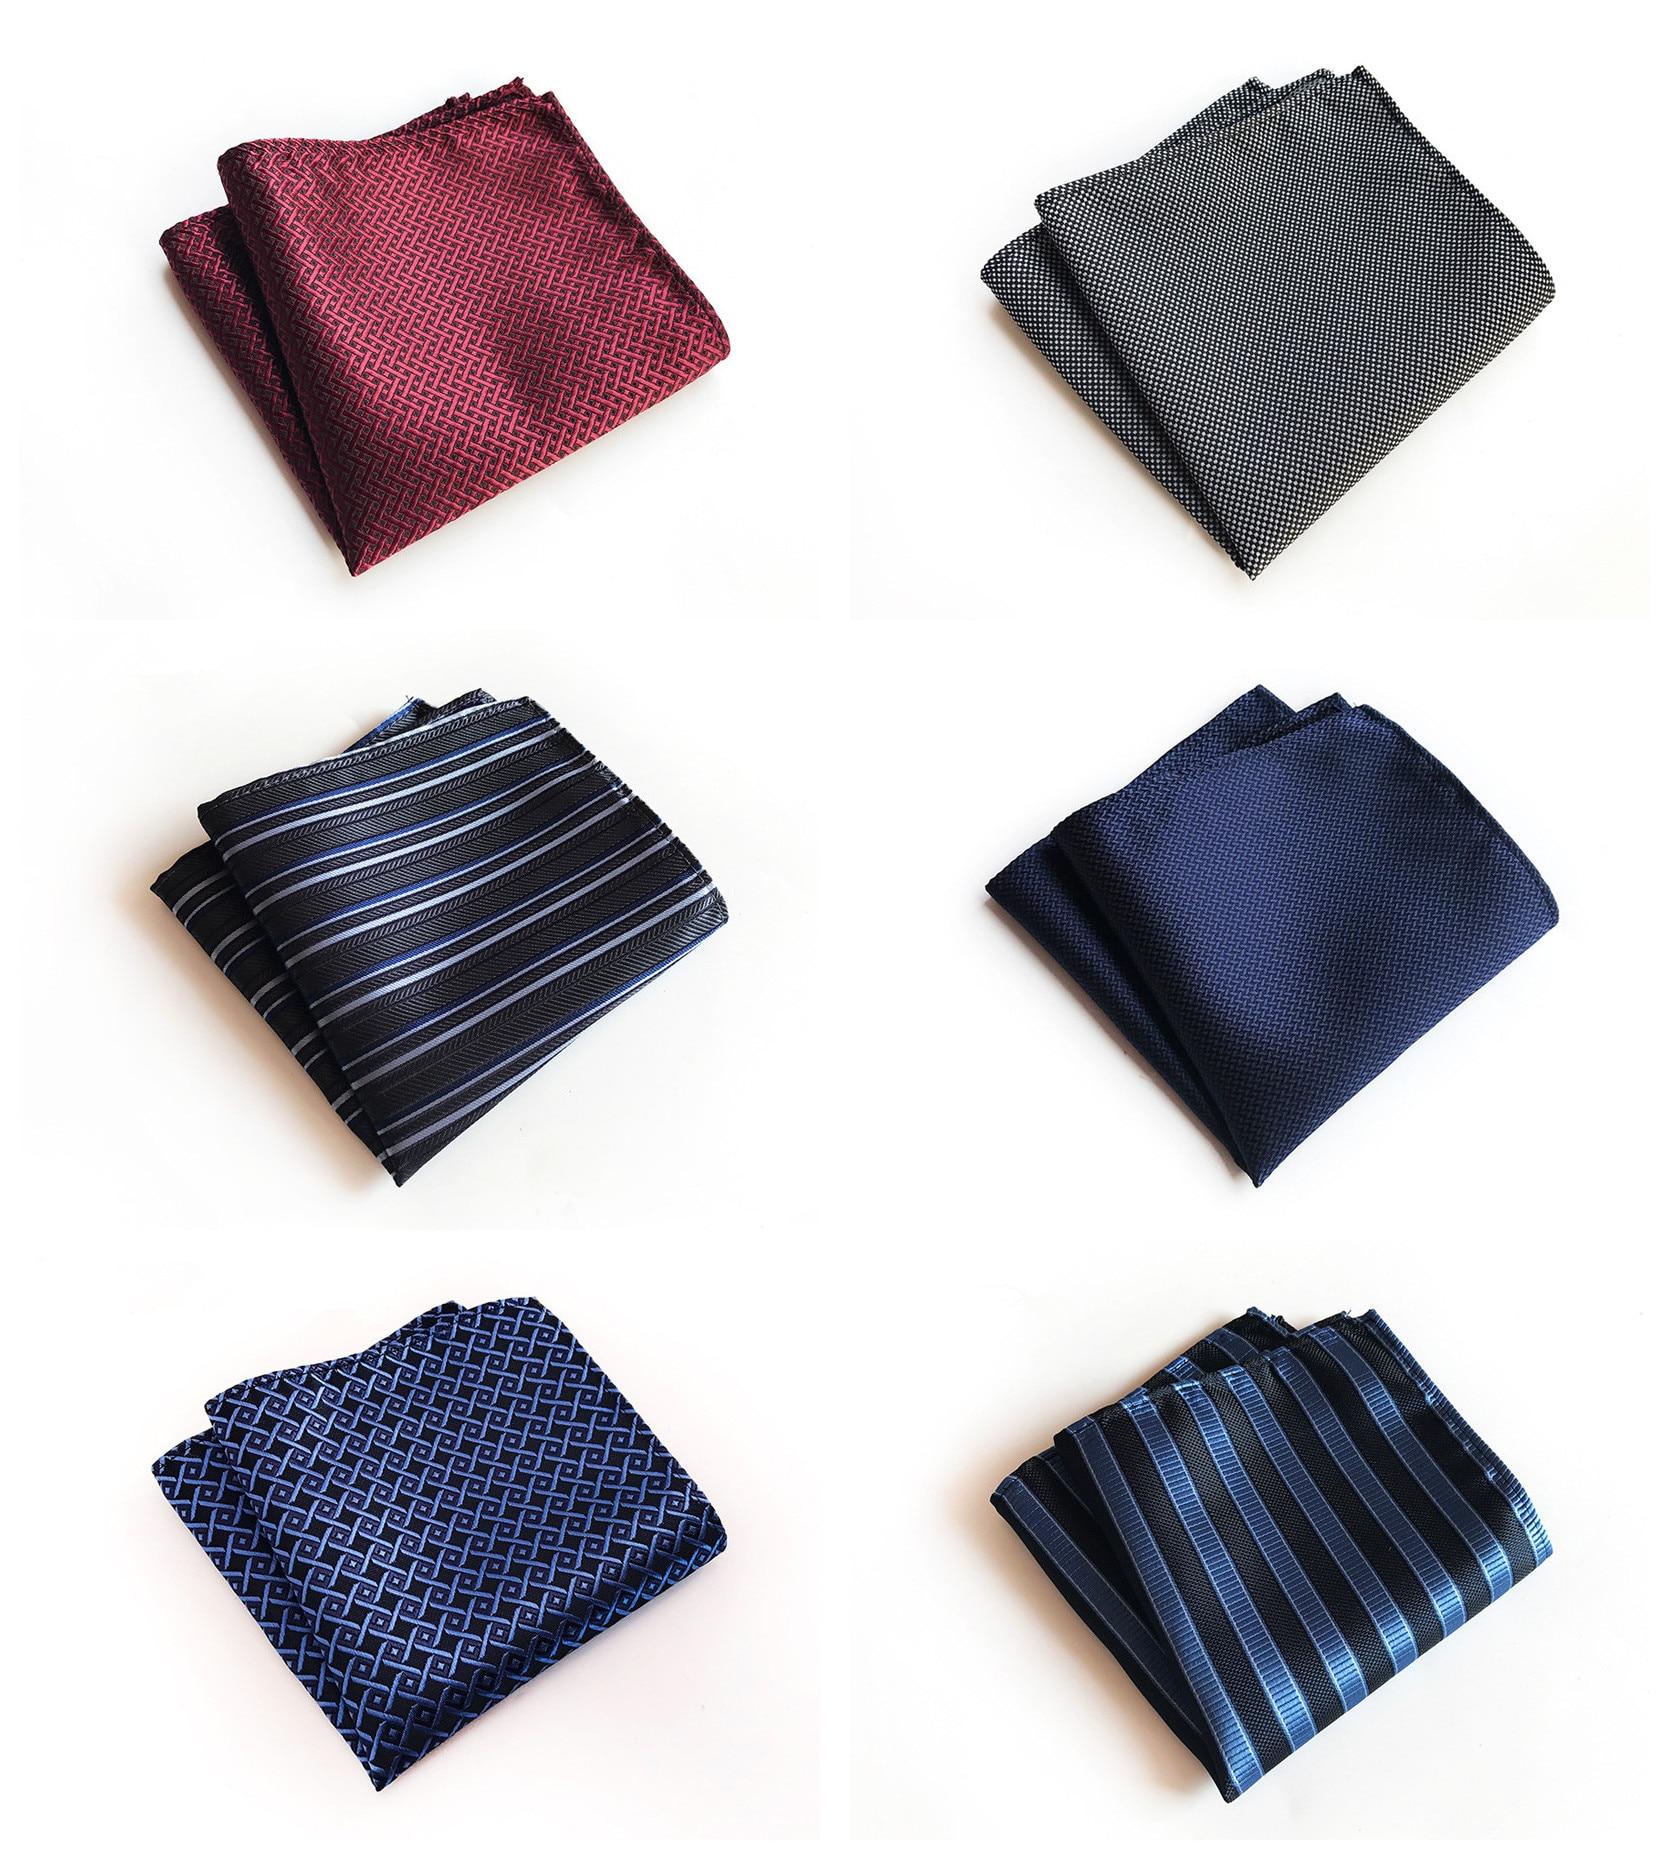 Retro Monochrome Business Dress High Quality Pocket Towel Unique Design Fashion Explosion Models 25x25cm Polyester Pocket Towel